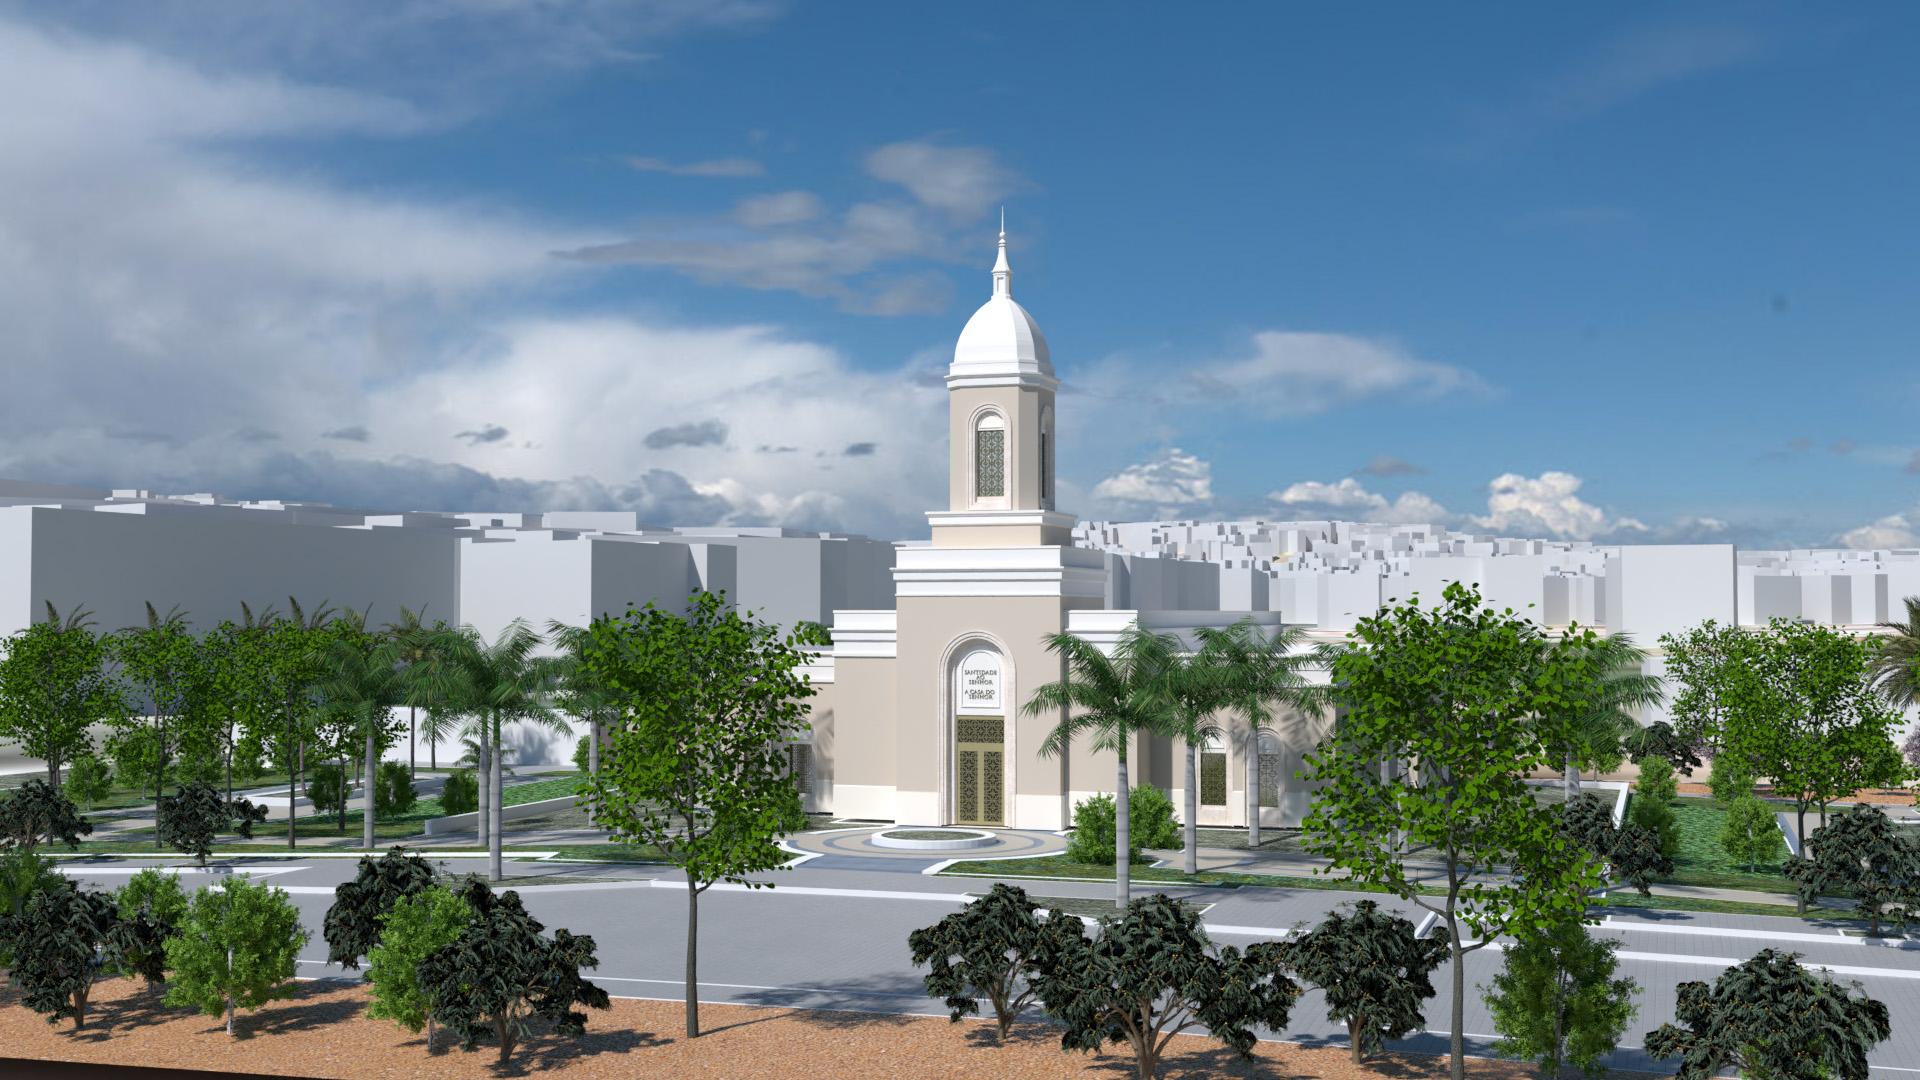 Praia cabo Verde Temple